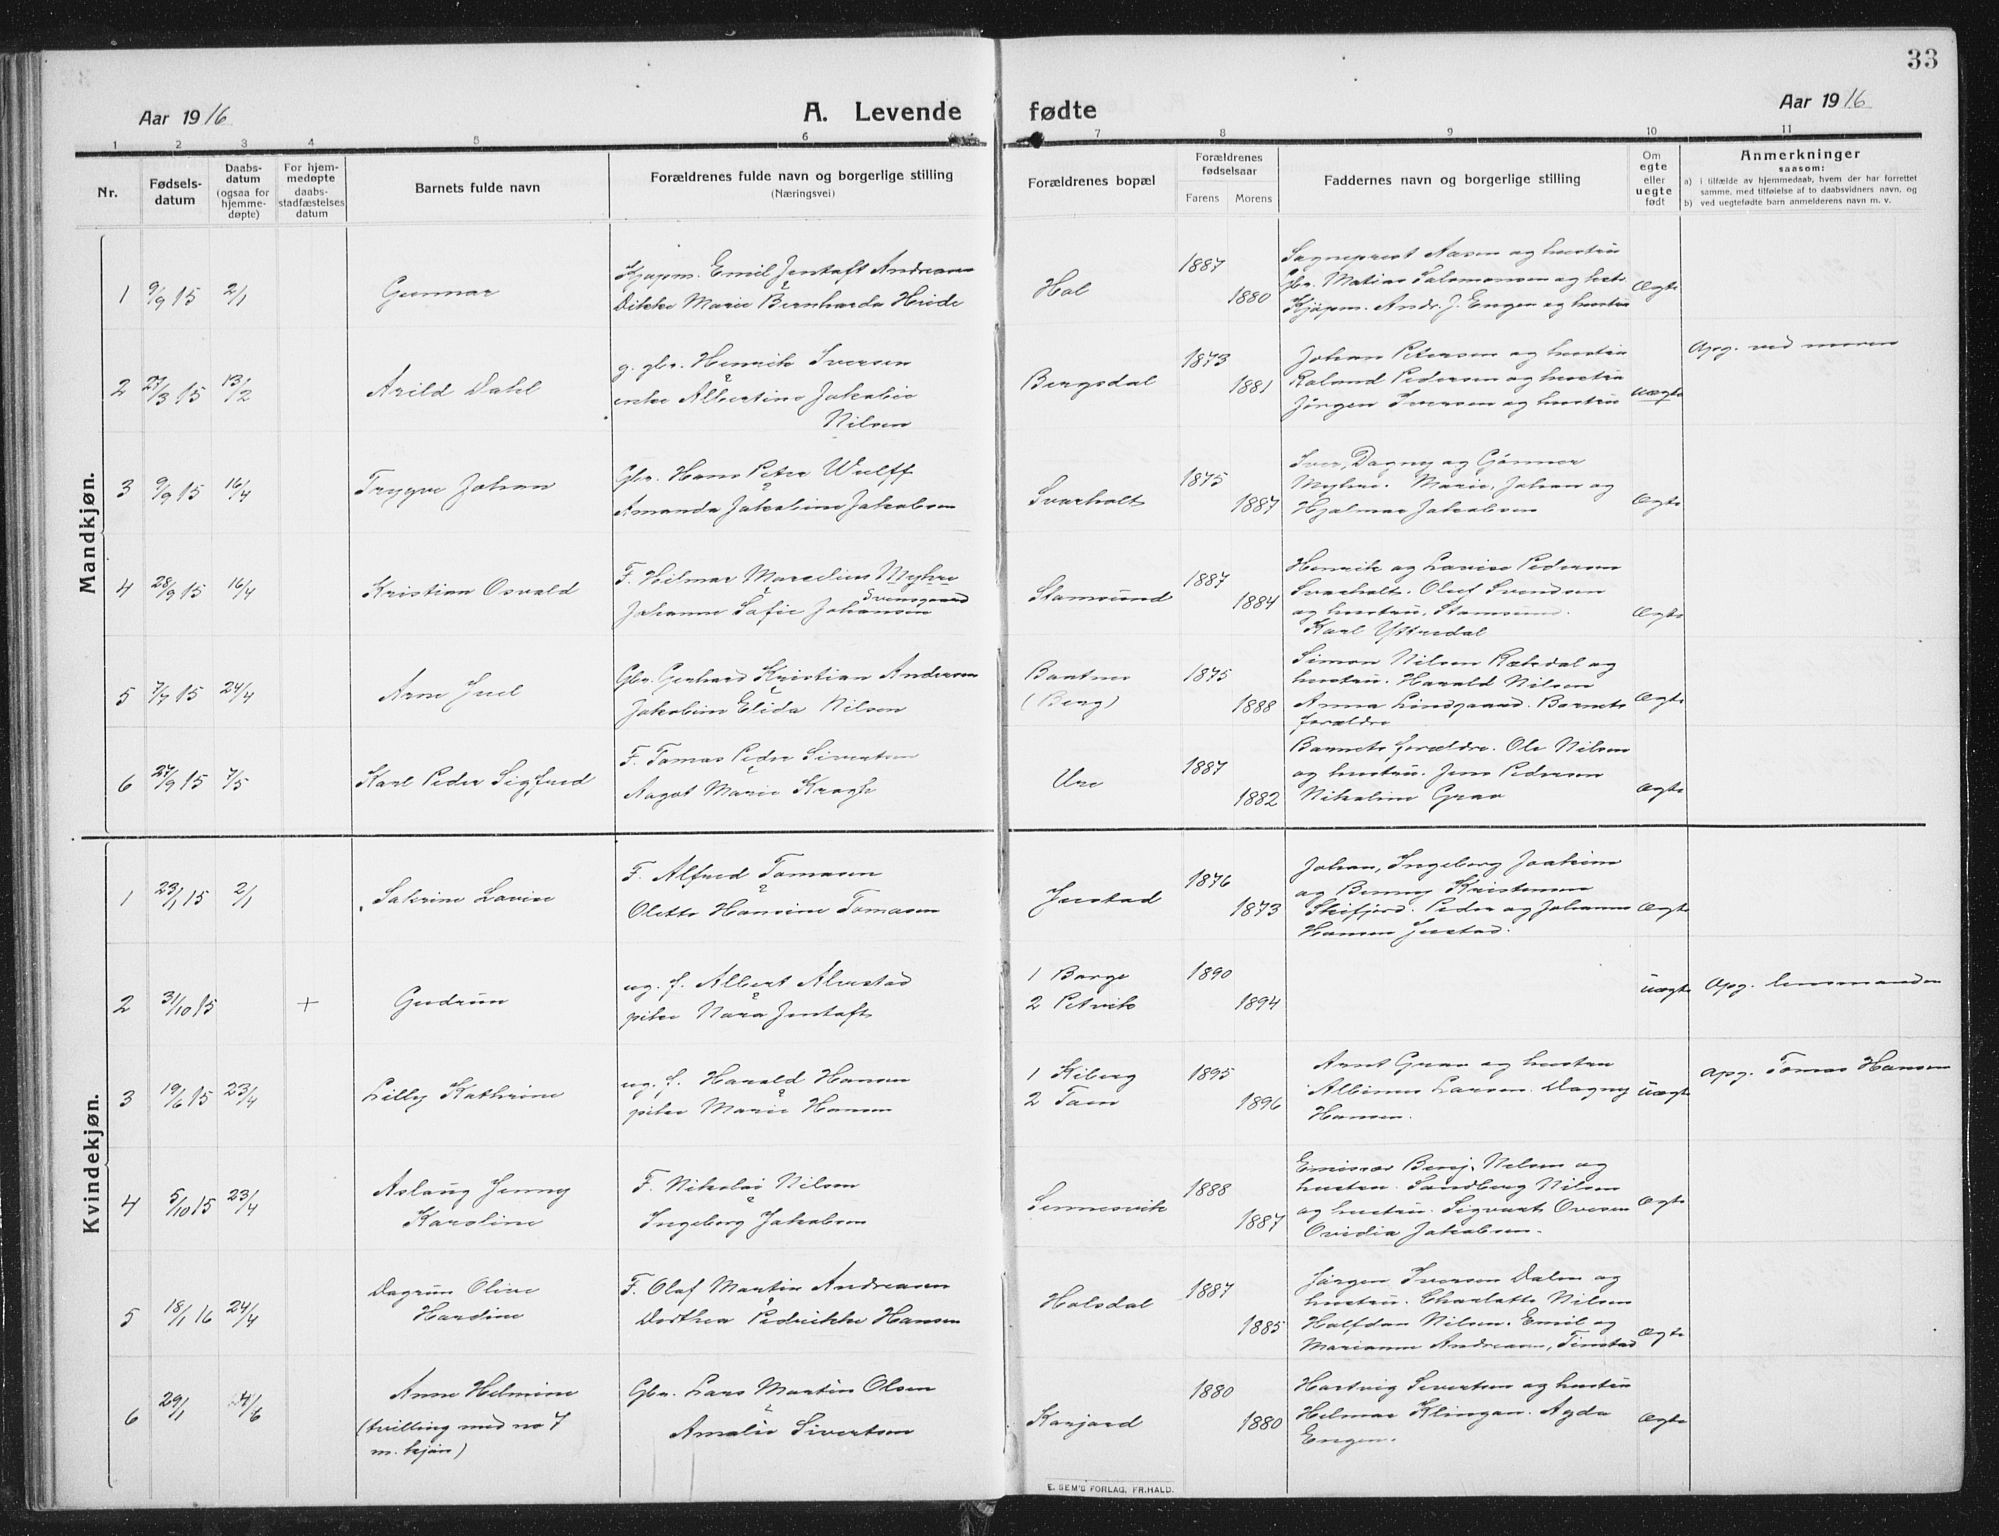 SAT, Ministerialprotokoller, klokkerbøker og fødselsregistre - Nordland, 882/L1183: Klokkerbok nr. 882C01, 1911-1938, s. 33